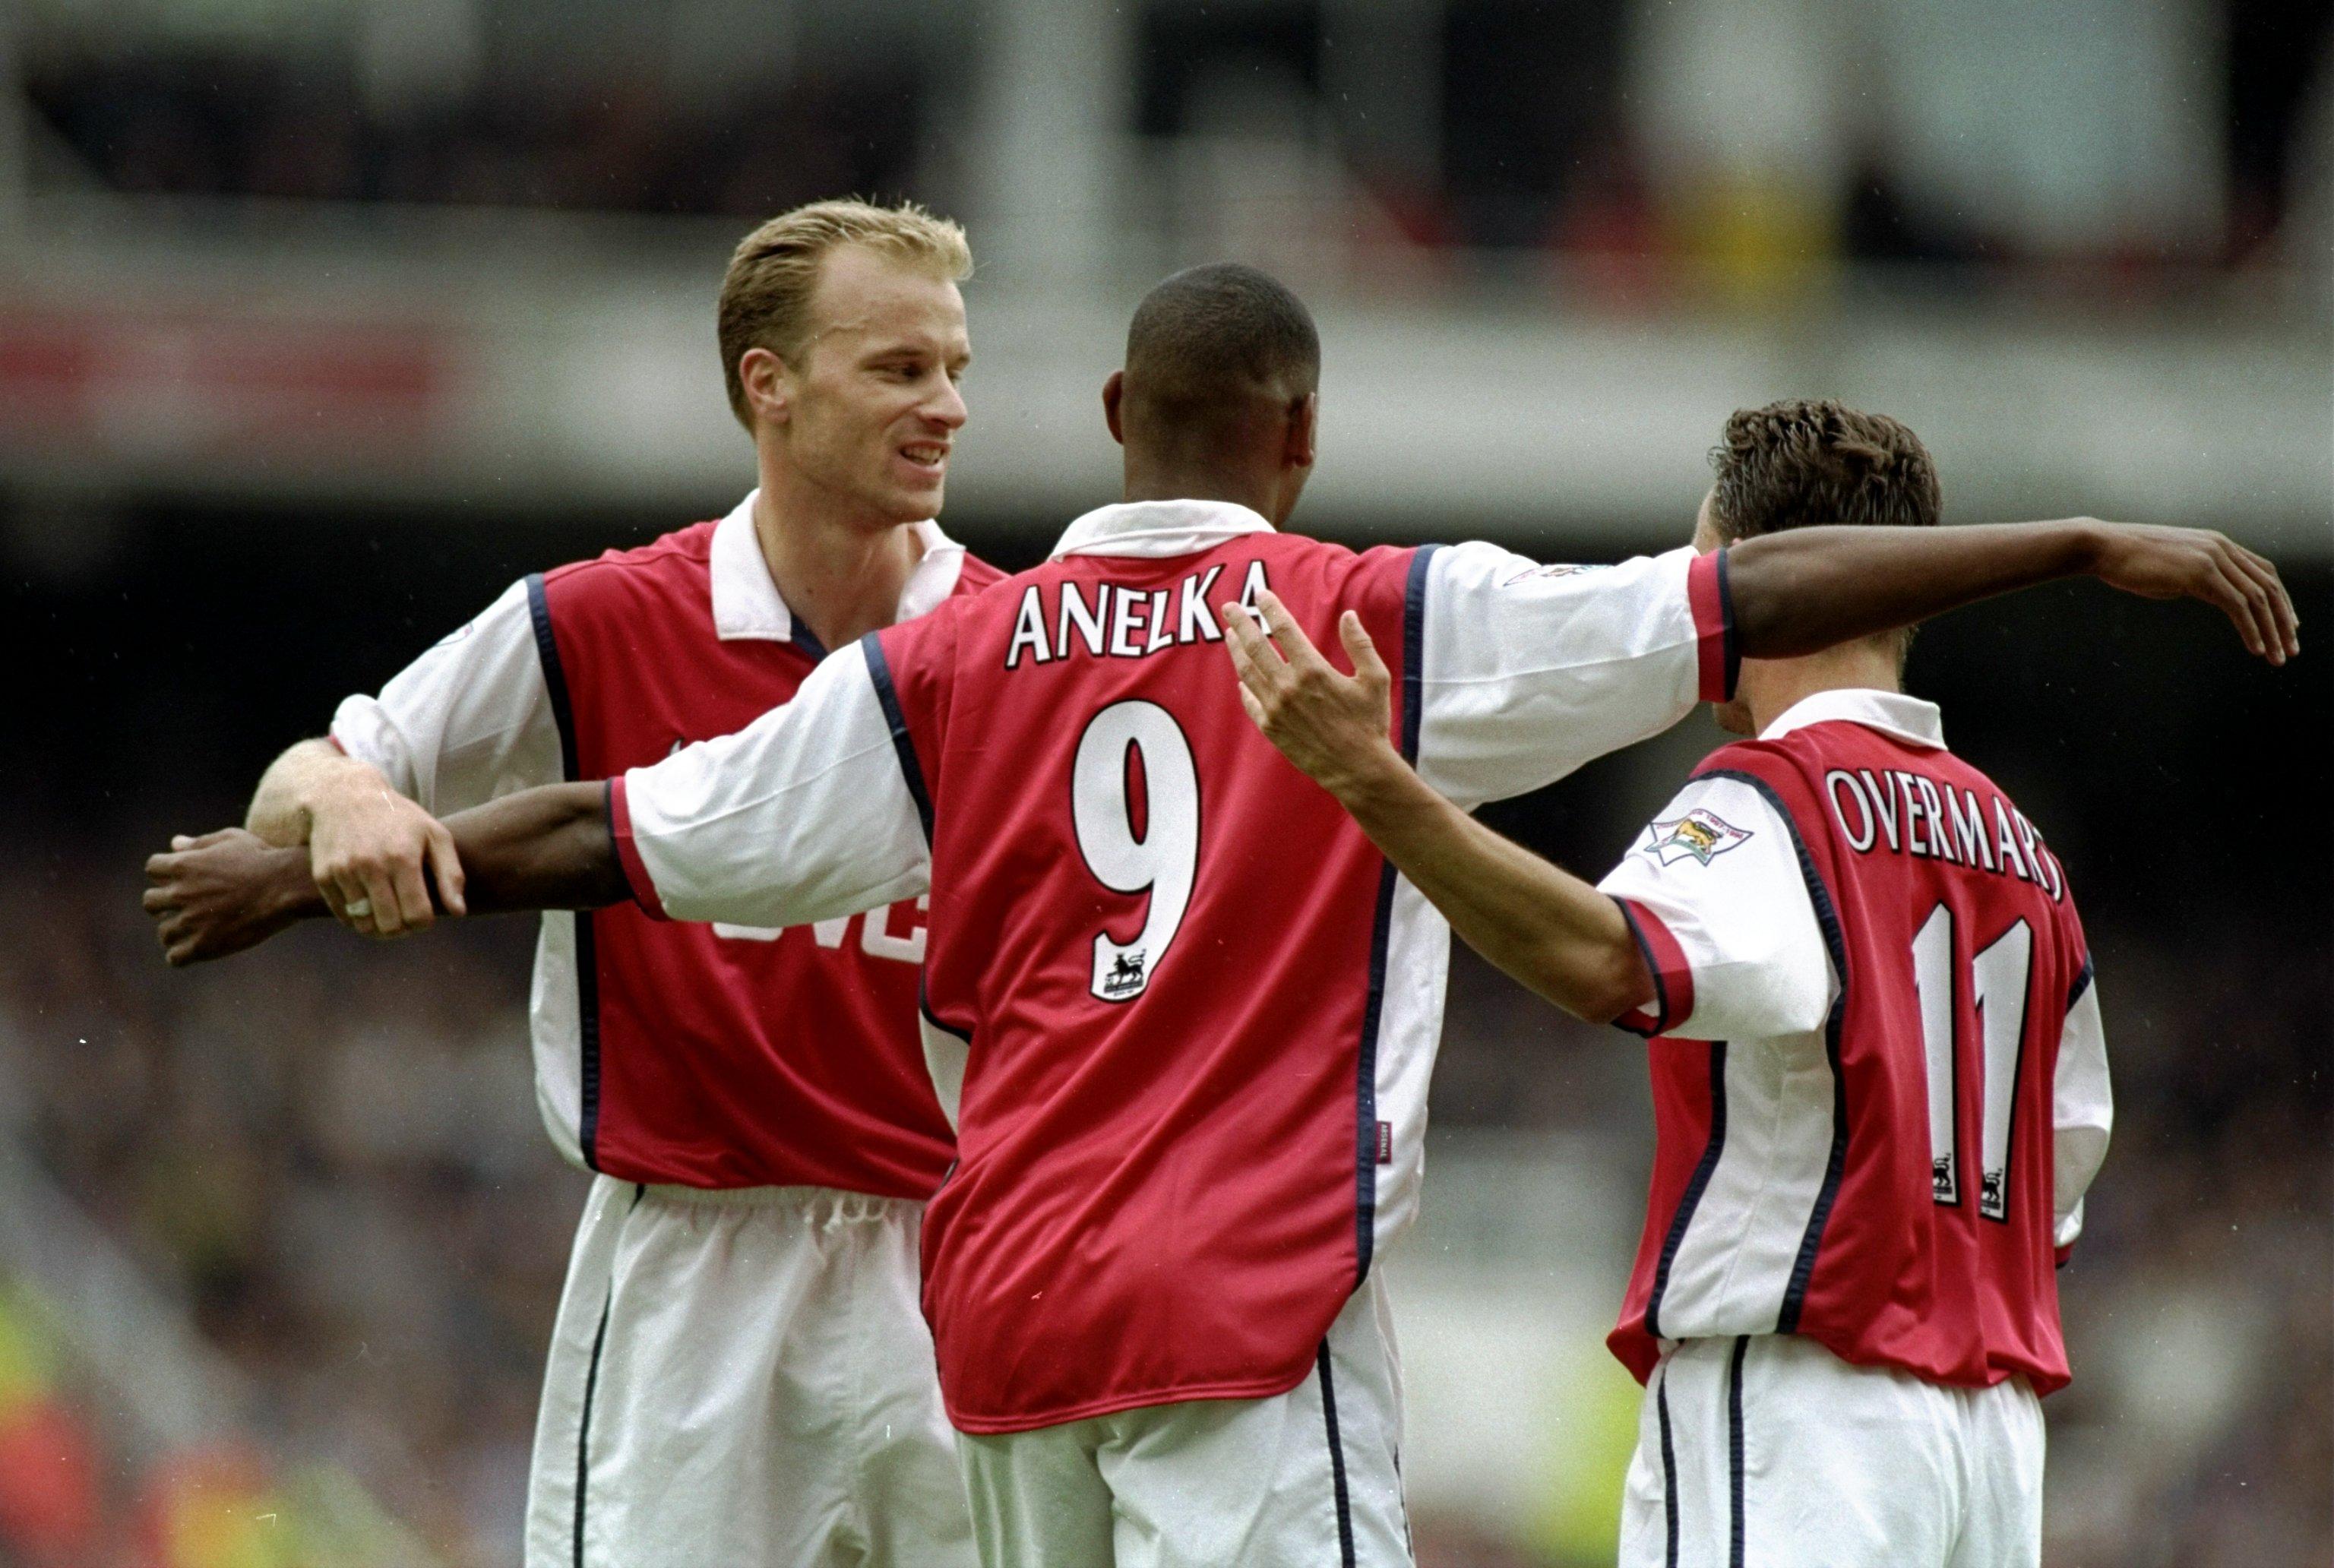 Arsenal's Theo Walcott, Mesut Ozil, and Alexis Sanchez remind Martin Keown of legendary trio